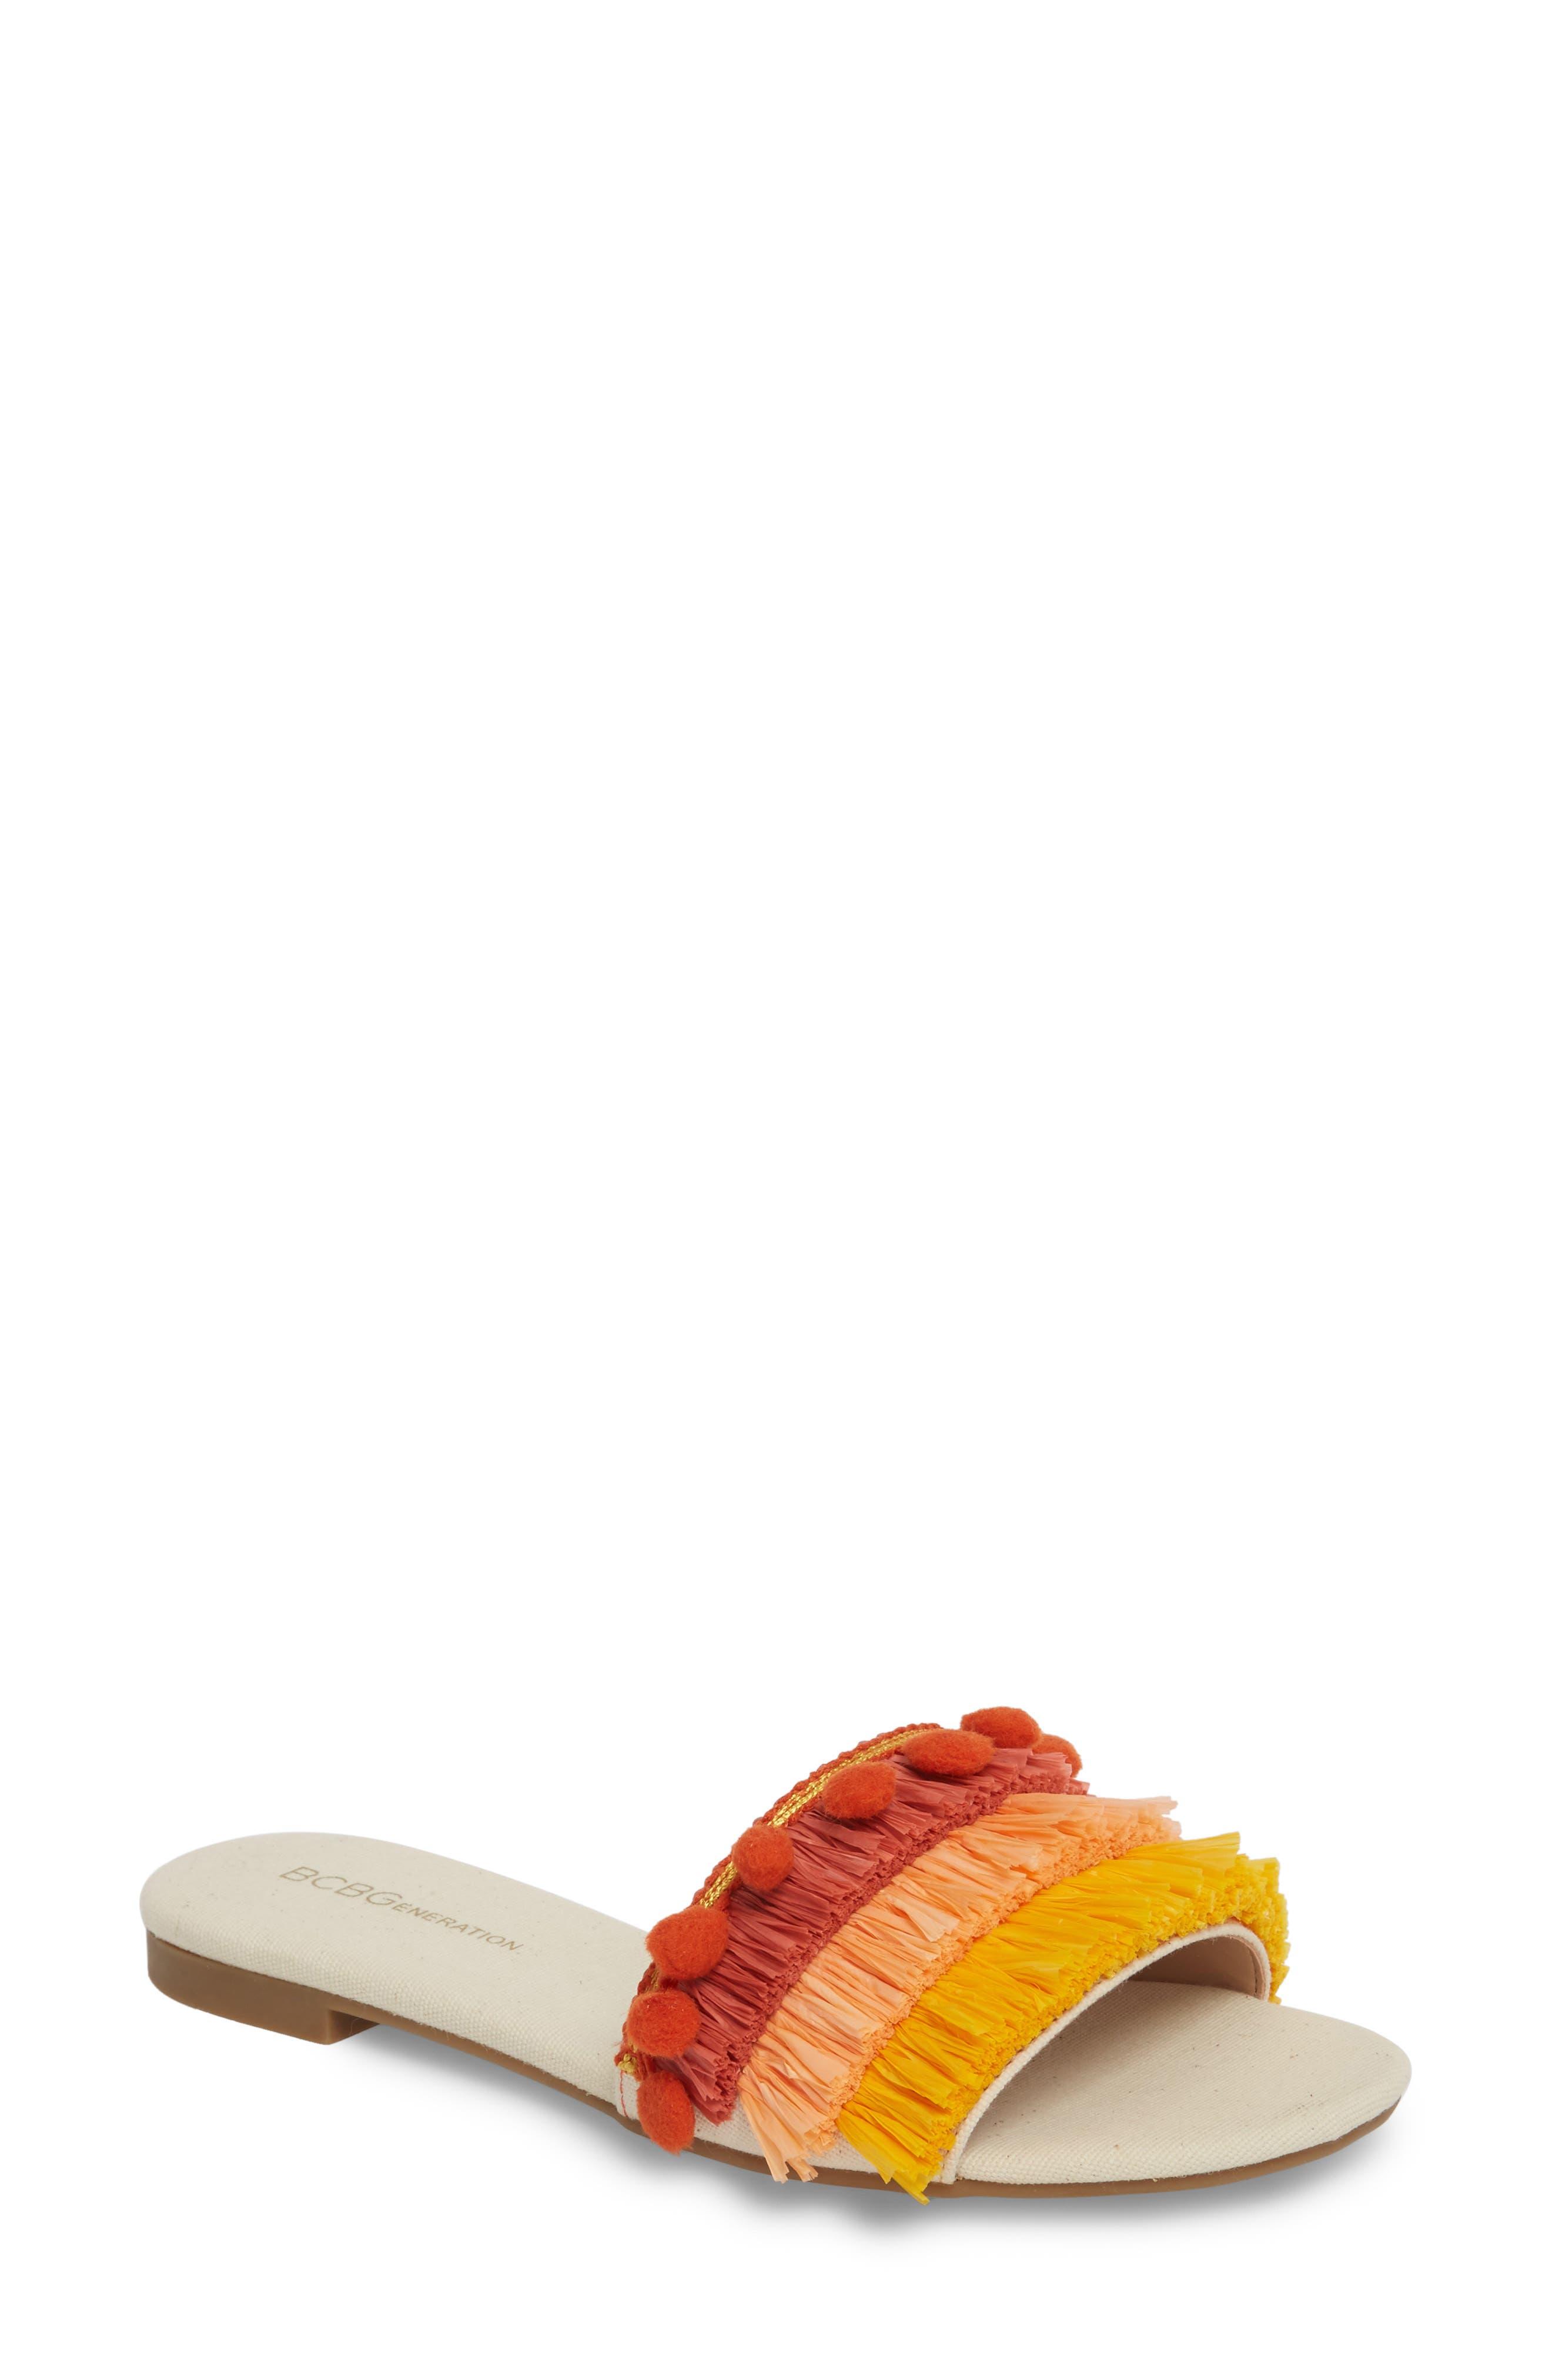 Genna Raffia Tier Slide Sandal,                         Main,                         color, Marigold/ Rust